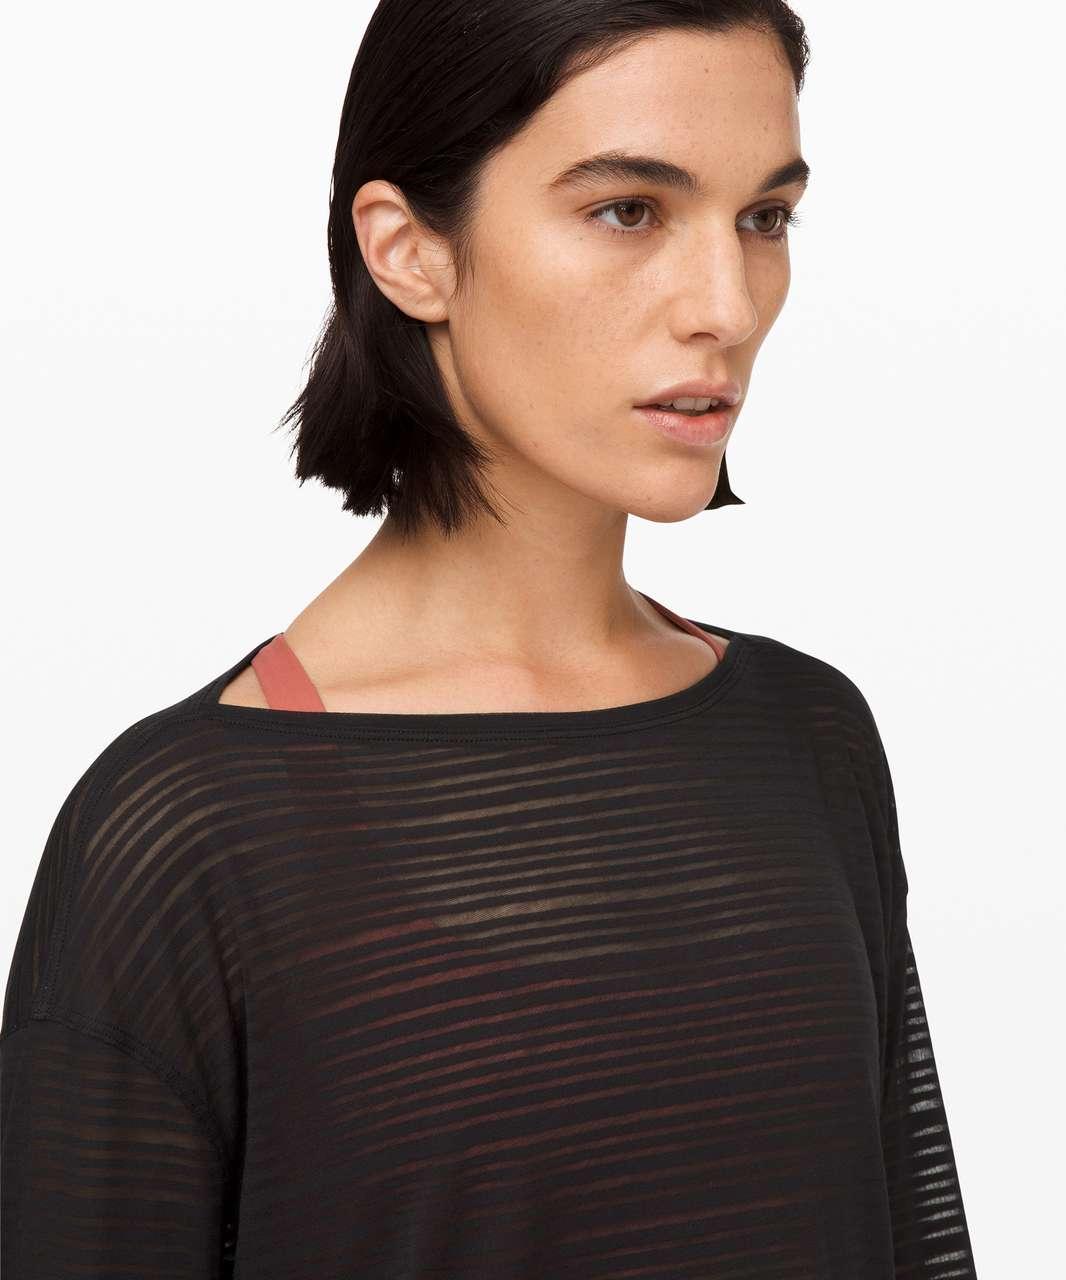 Lululemon Back in Action Long Sleeve *Sheer - Luminous Stripe Burnout Black